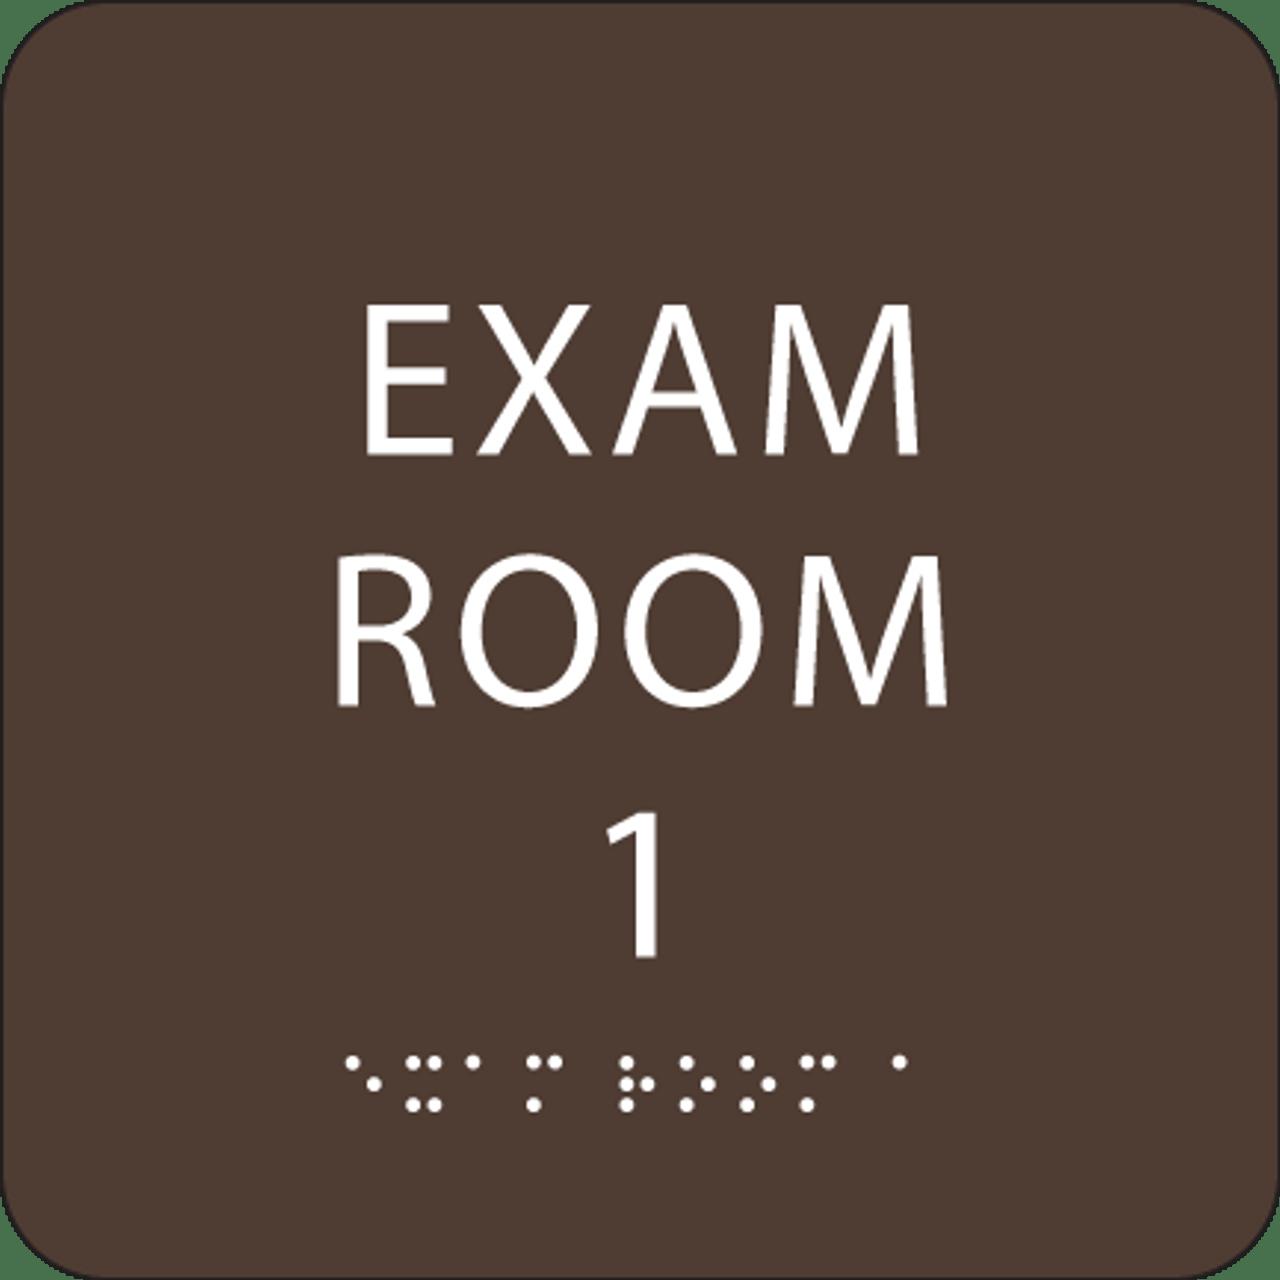 Dark Brown Exam Room 1 ADA Sign